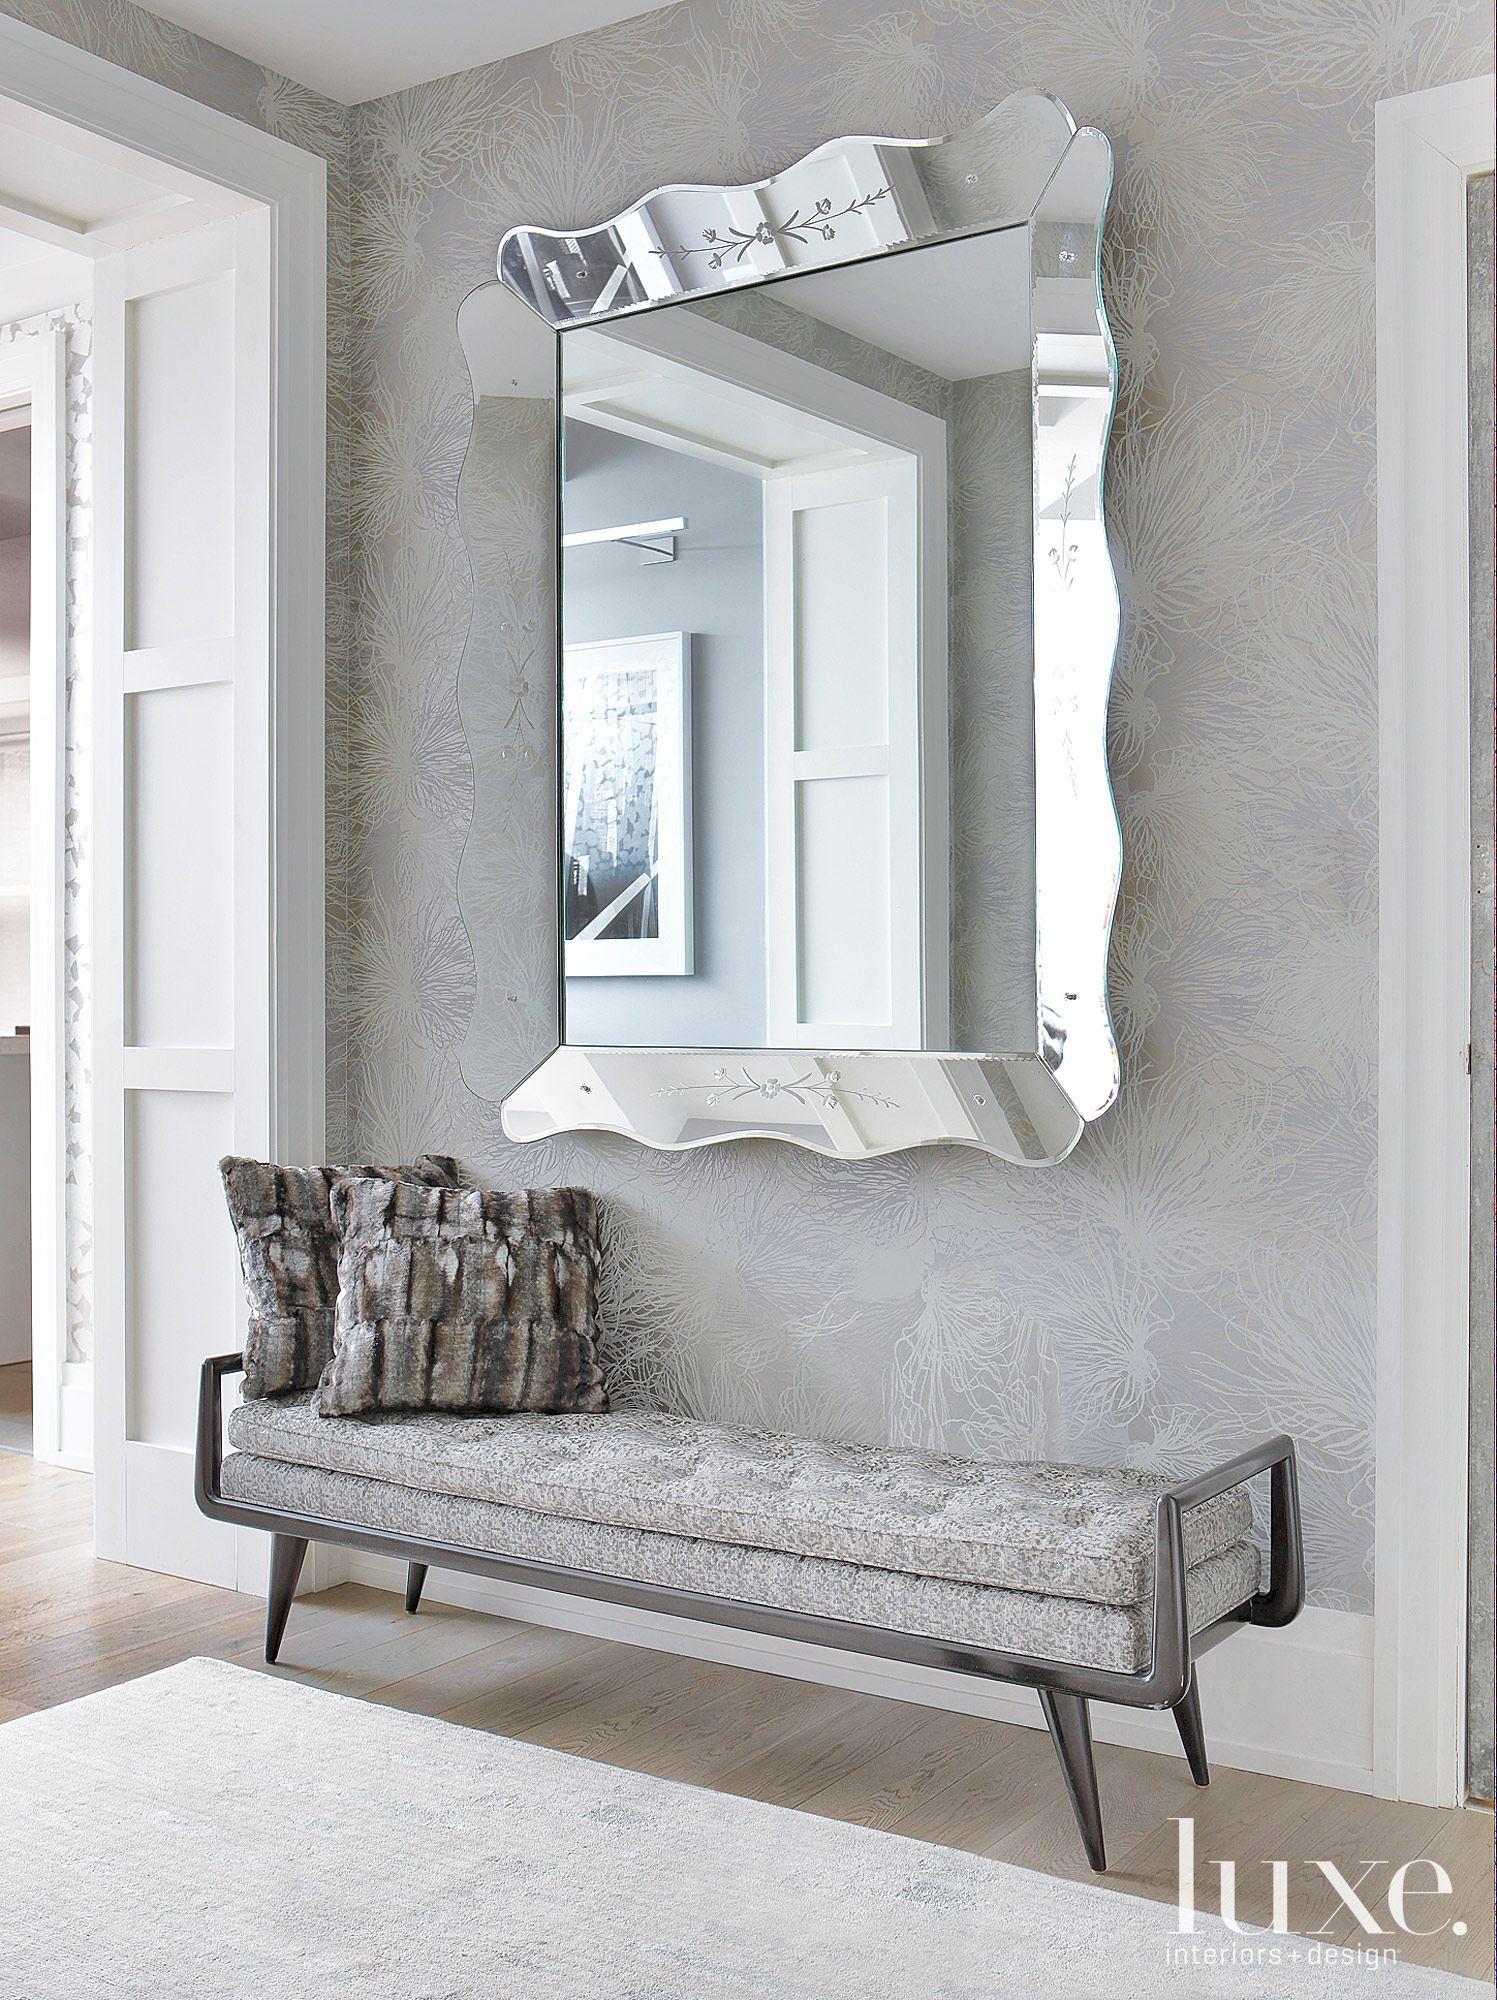 Top 20 Luxe Spaces Seen Across Pinterest Luxedaily Design